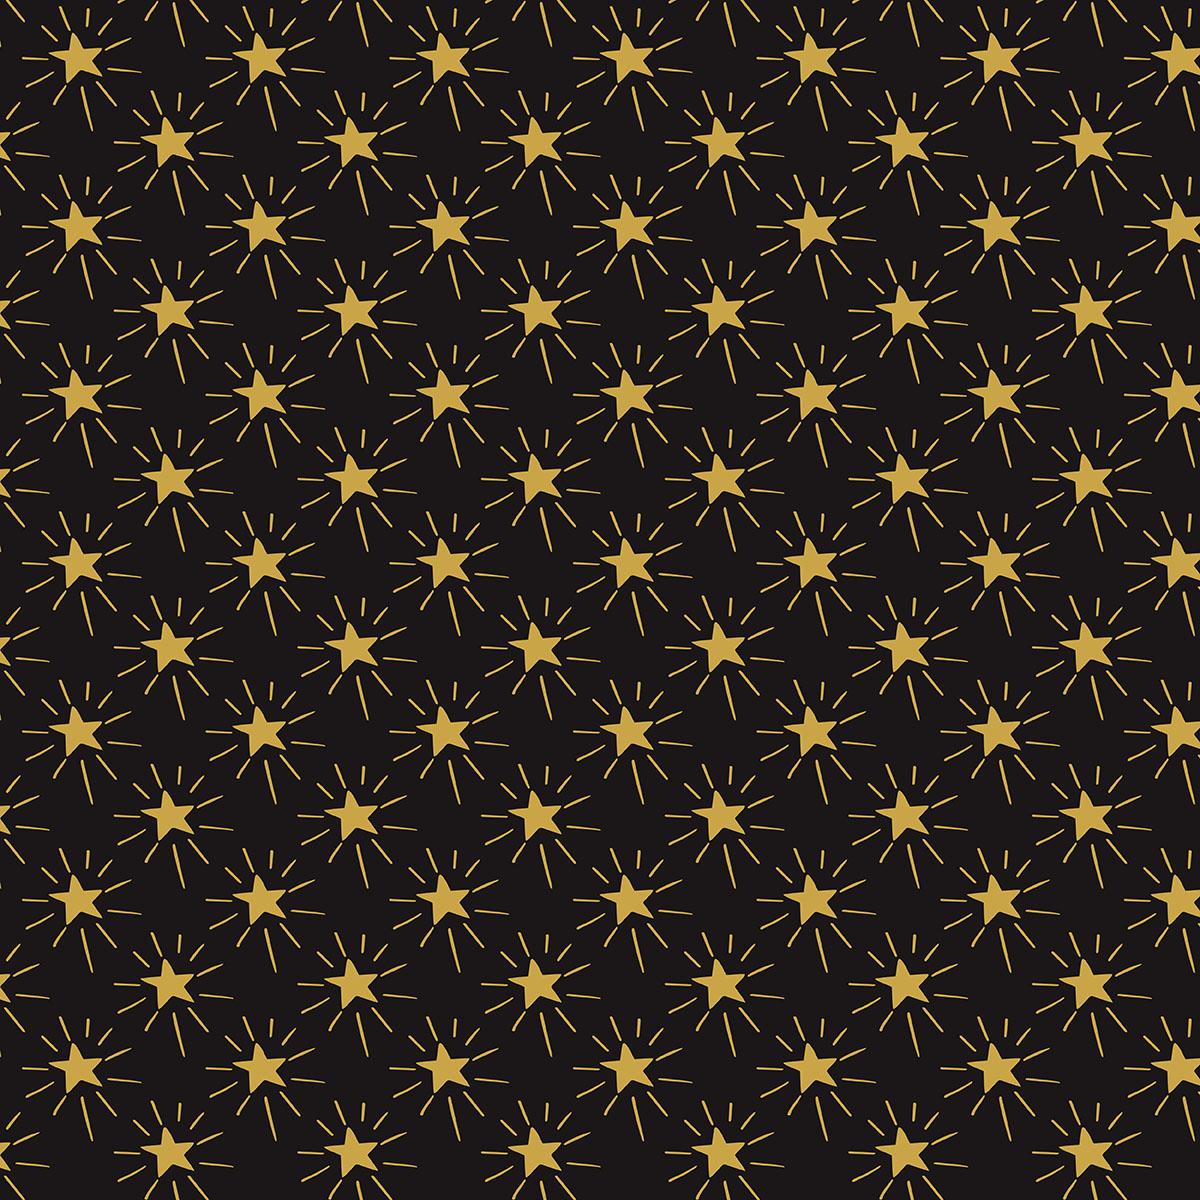 1200x1200 Hand Drawn Star Free Vector Art